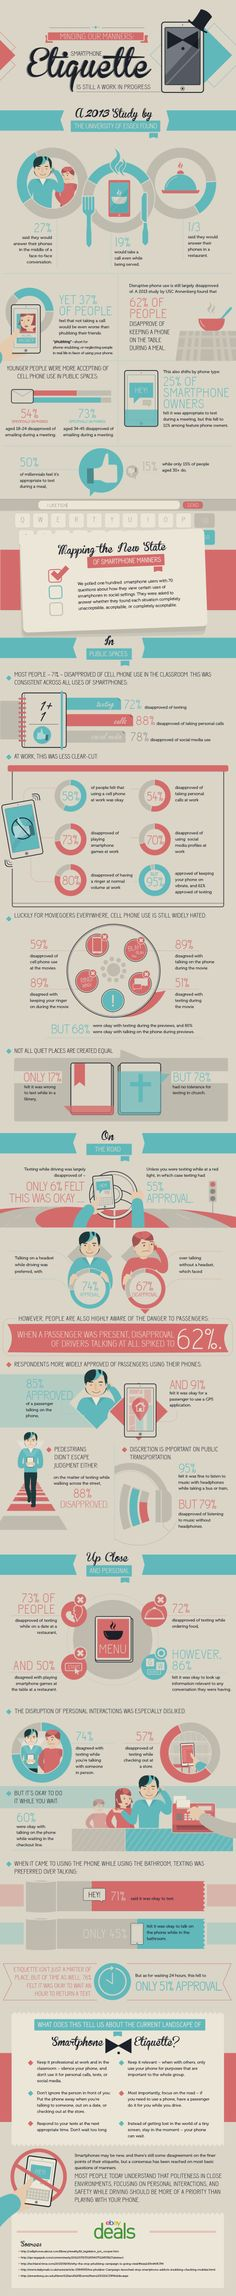 Smartphone etiquette #infografia #infographic